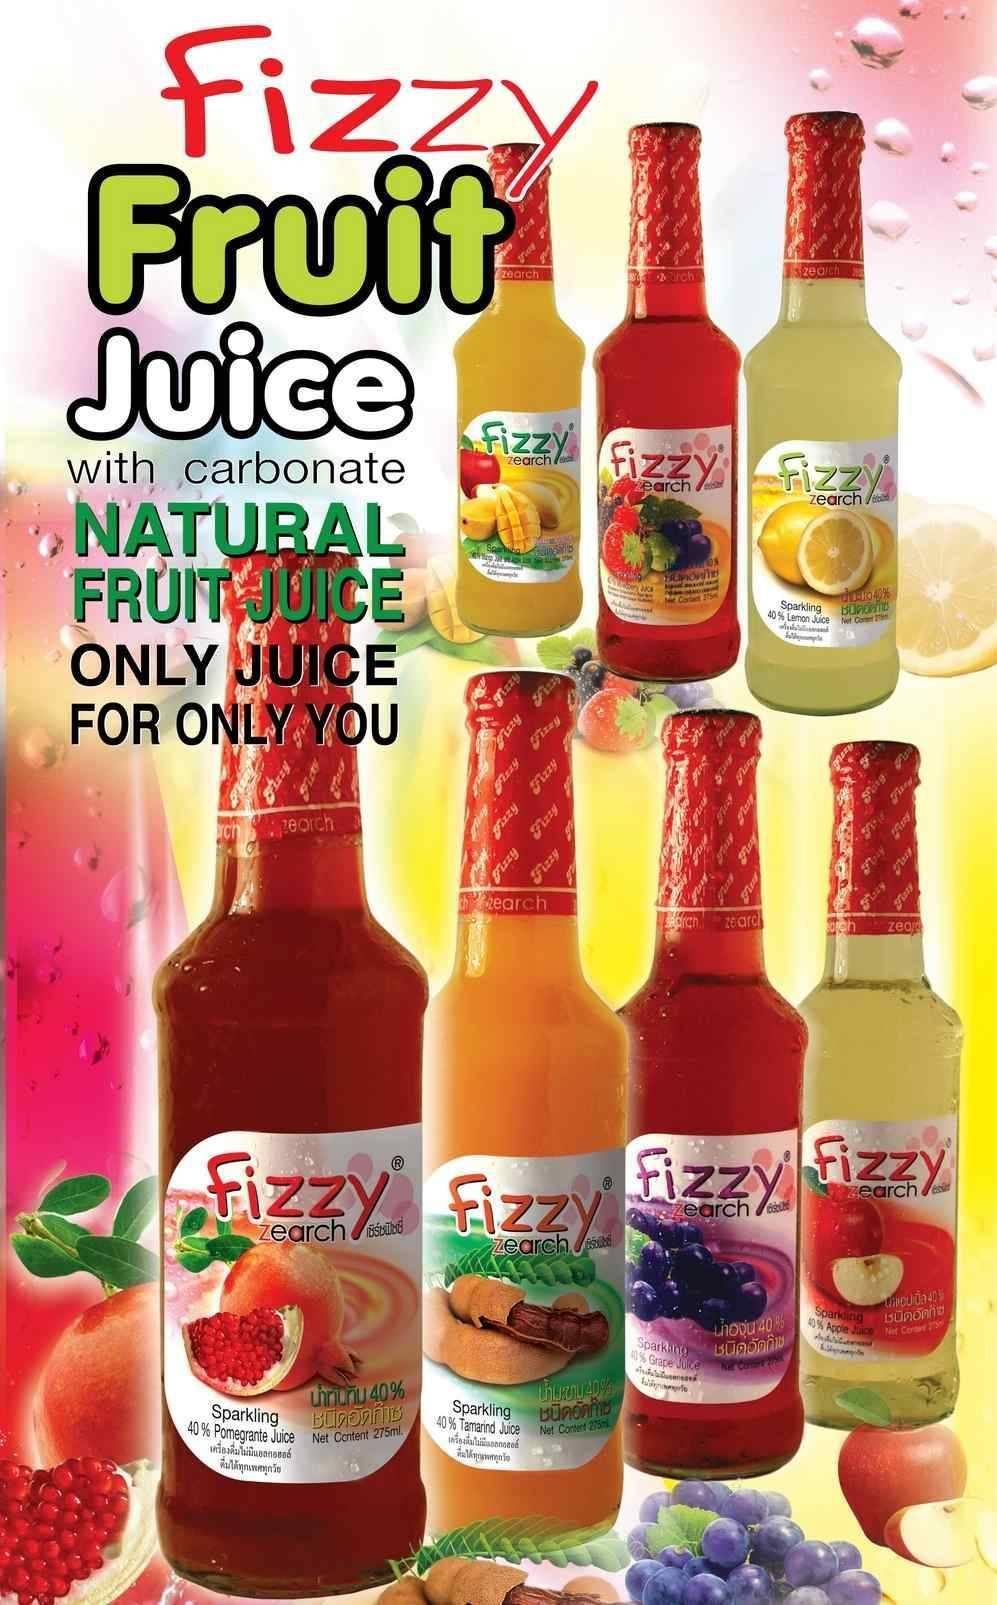 Fizzy 40% sparkling fruit juice